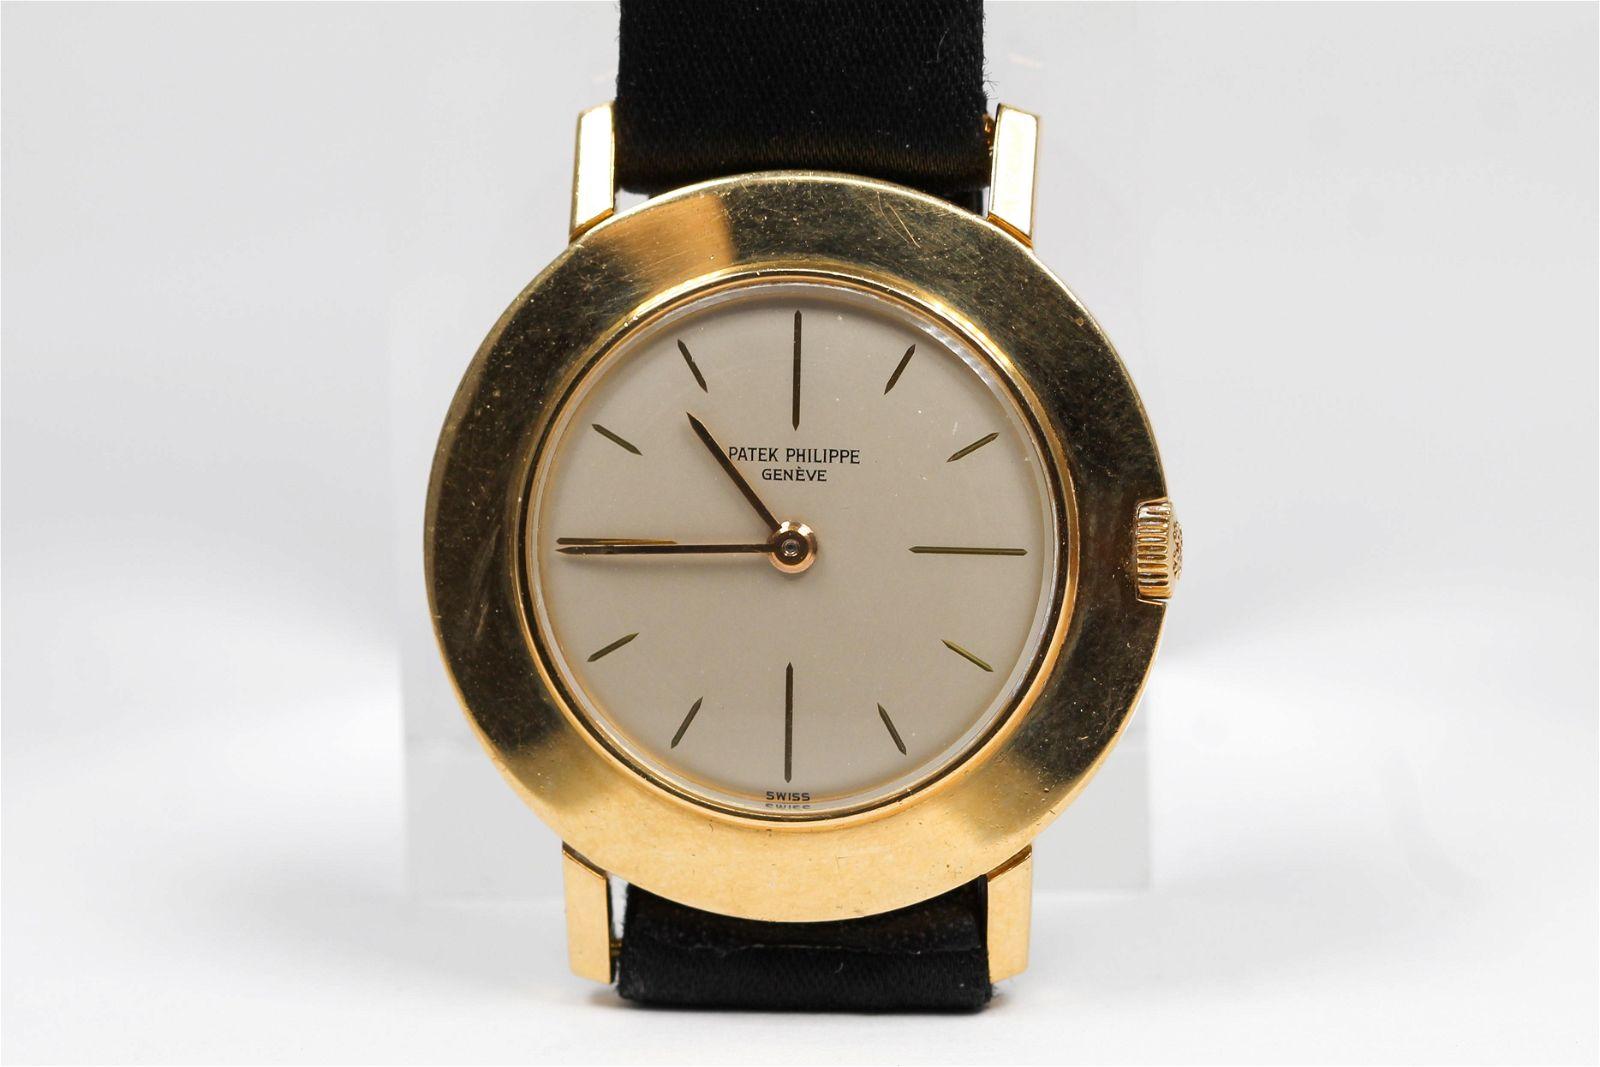 Vintage Patek Philippe Geneve Wristwatch in 18k Yellow